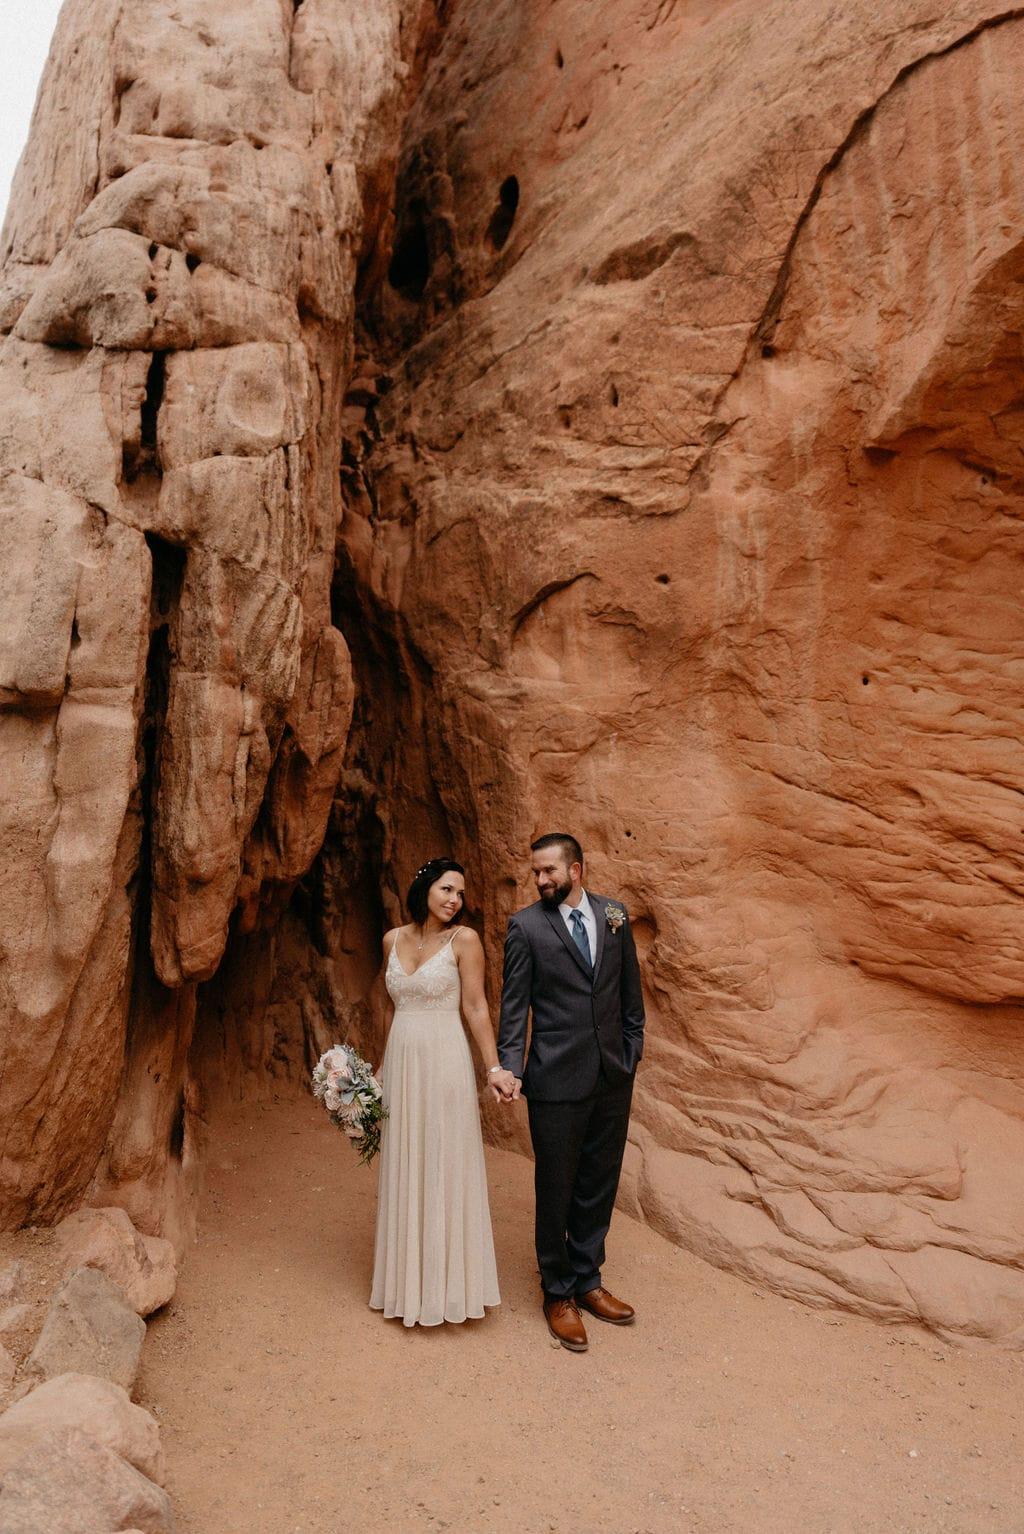 Sentinel Plaza Garden of the Gods Wedding Ceremony Location